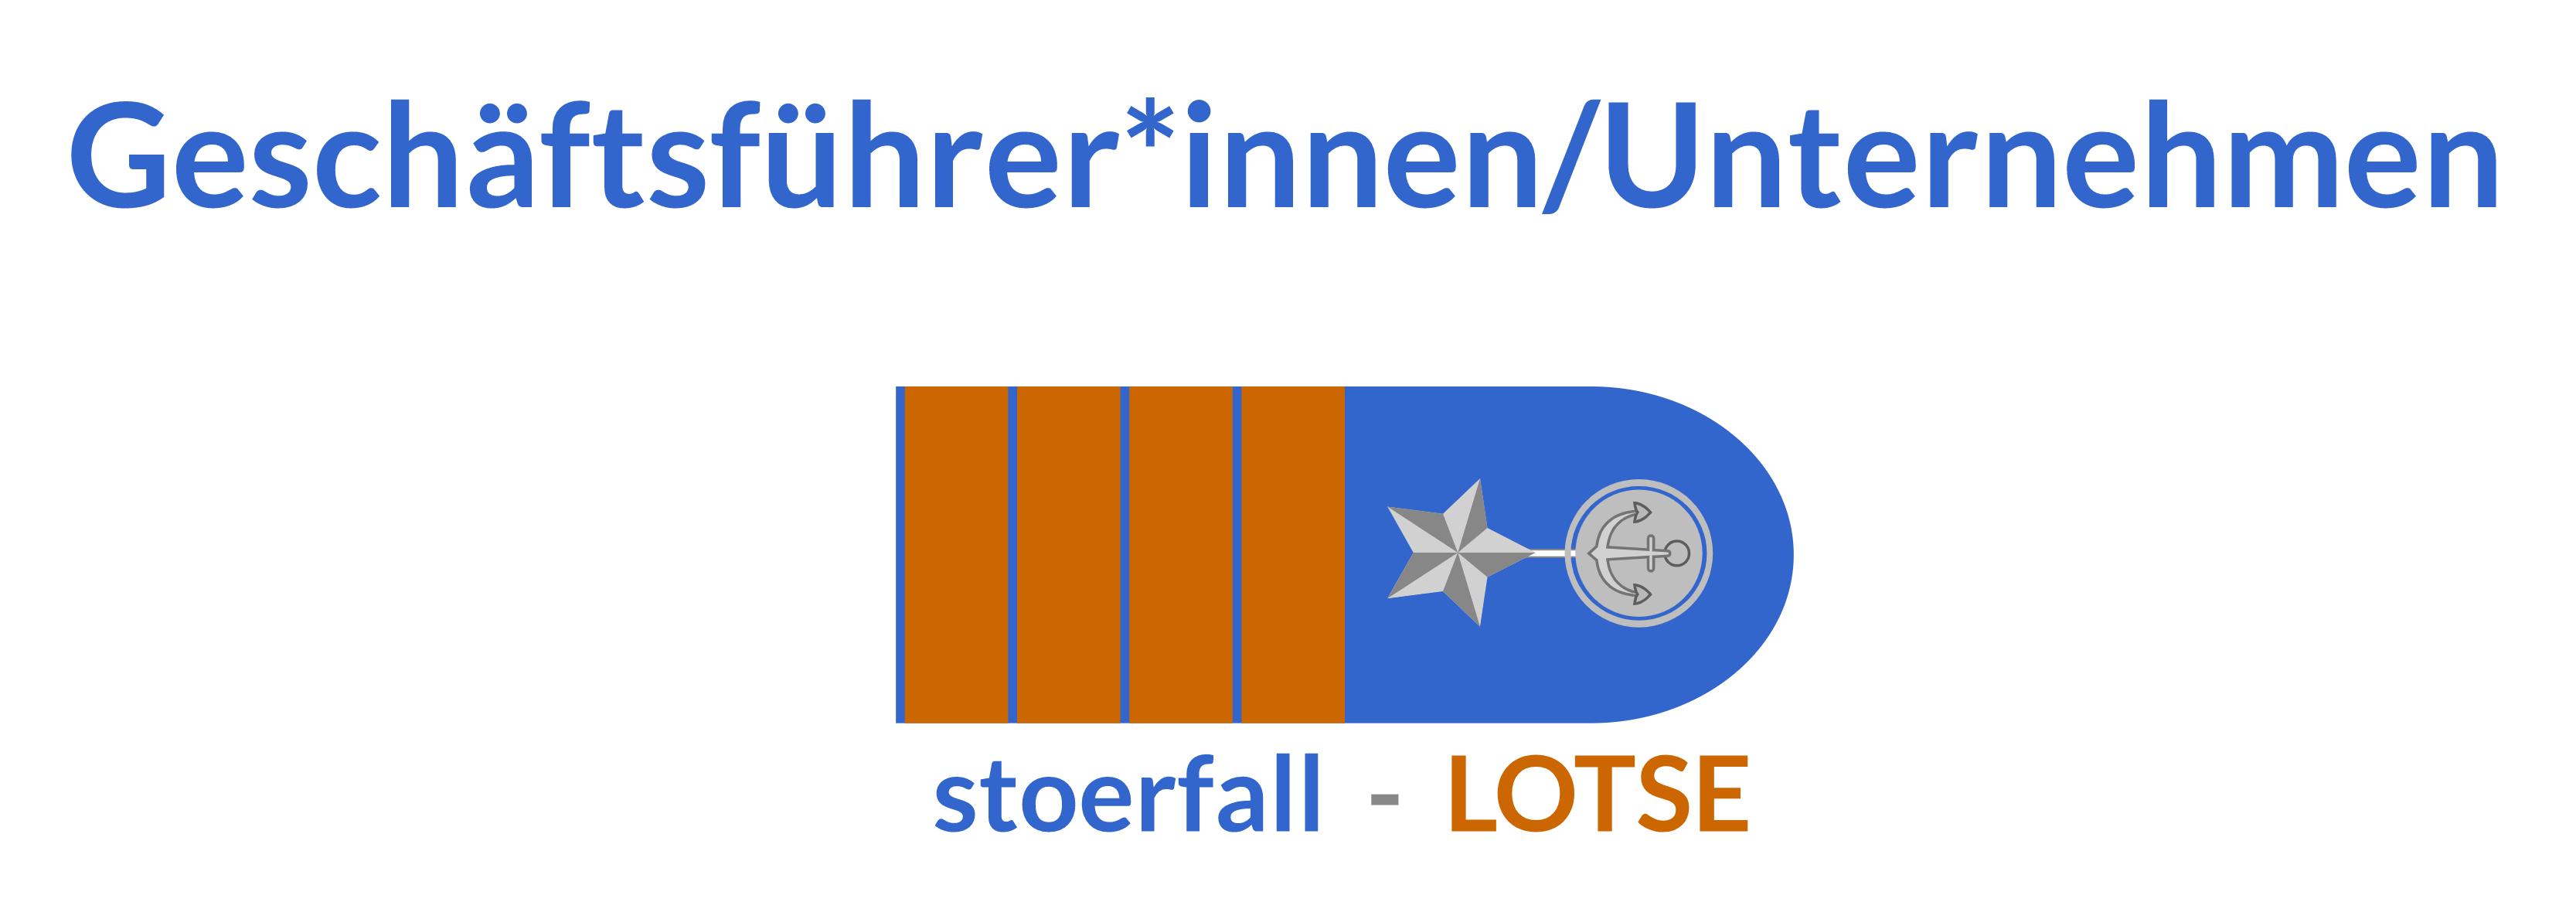 Geschäftsführer*innen/Unternehmen = stoerfall-lotse.de